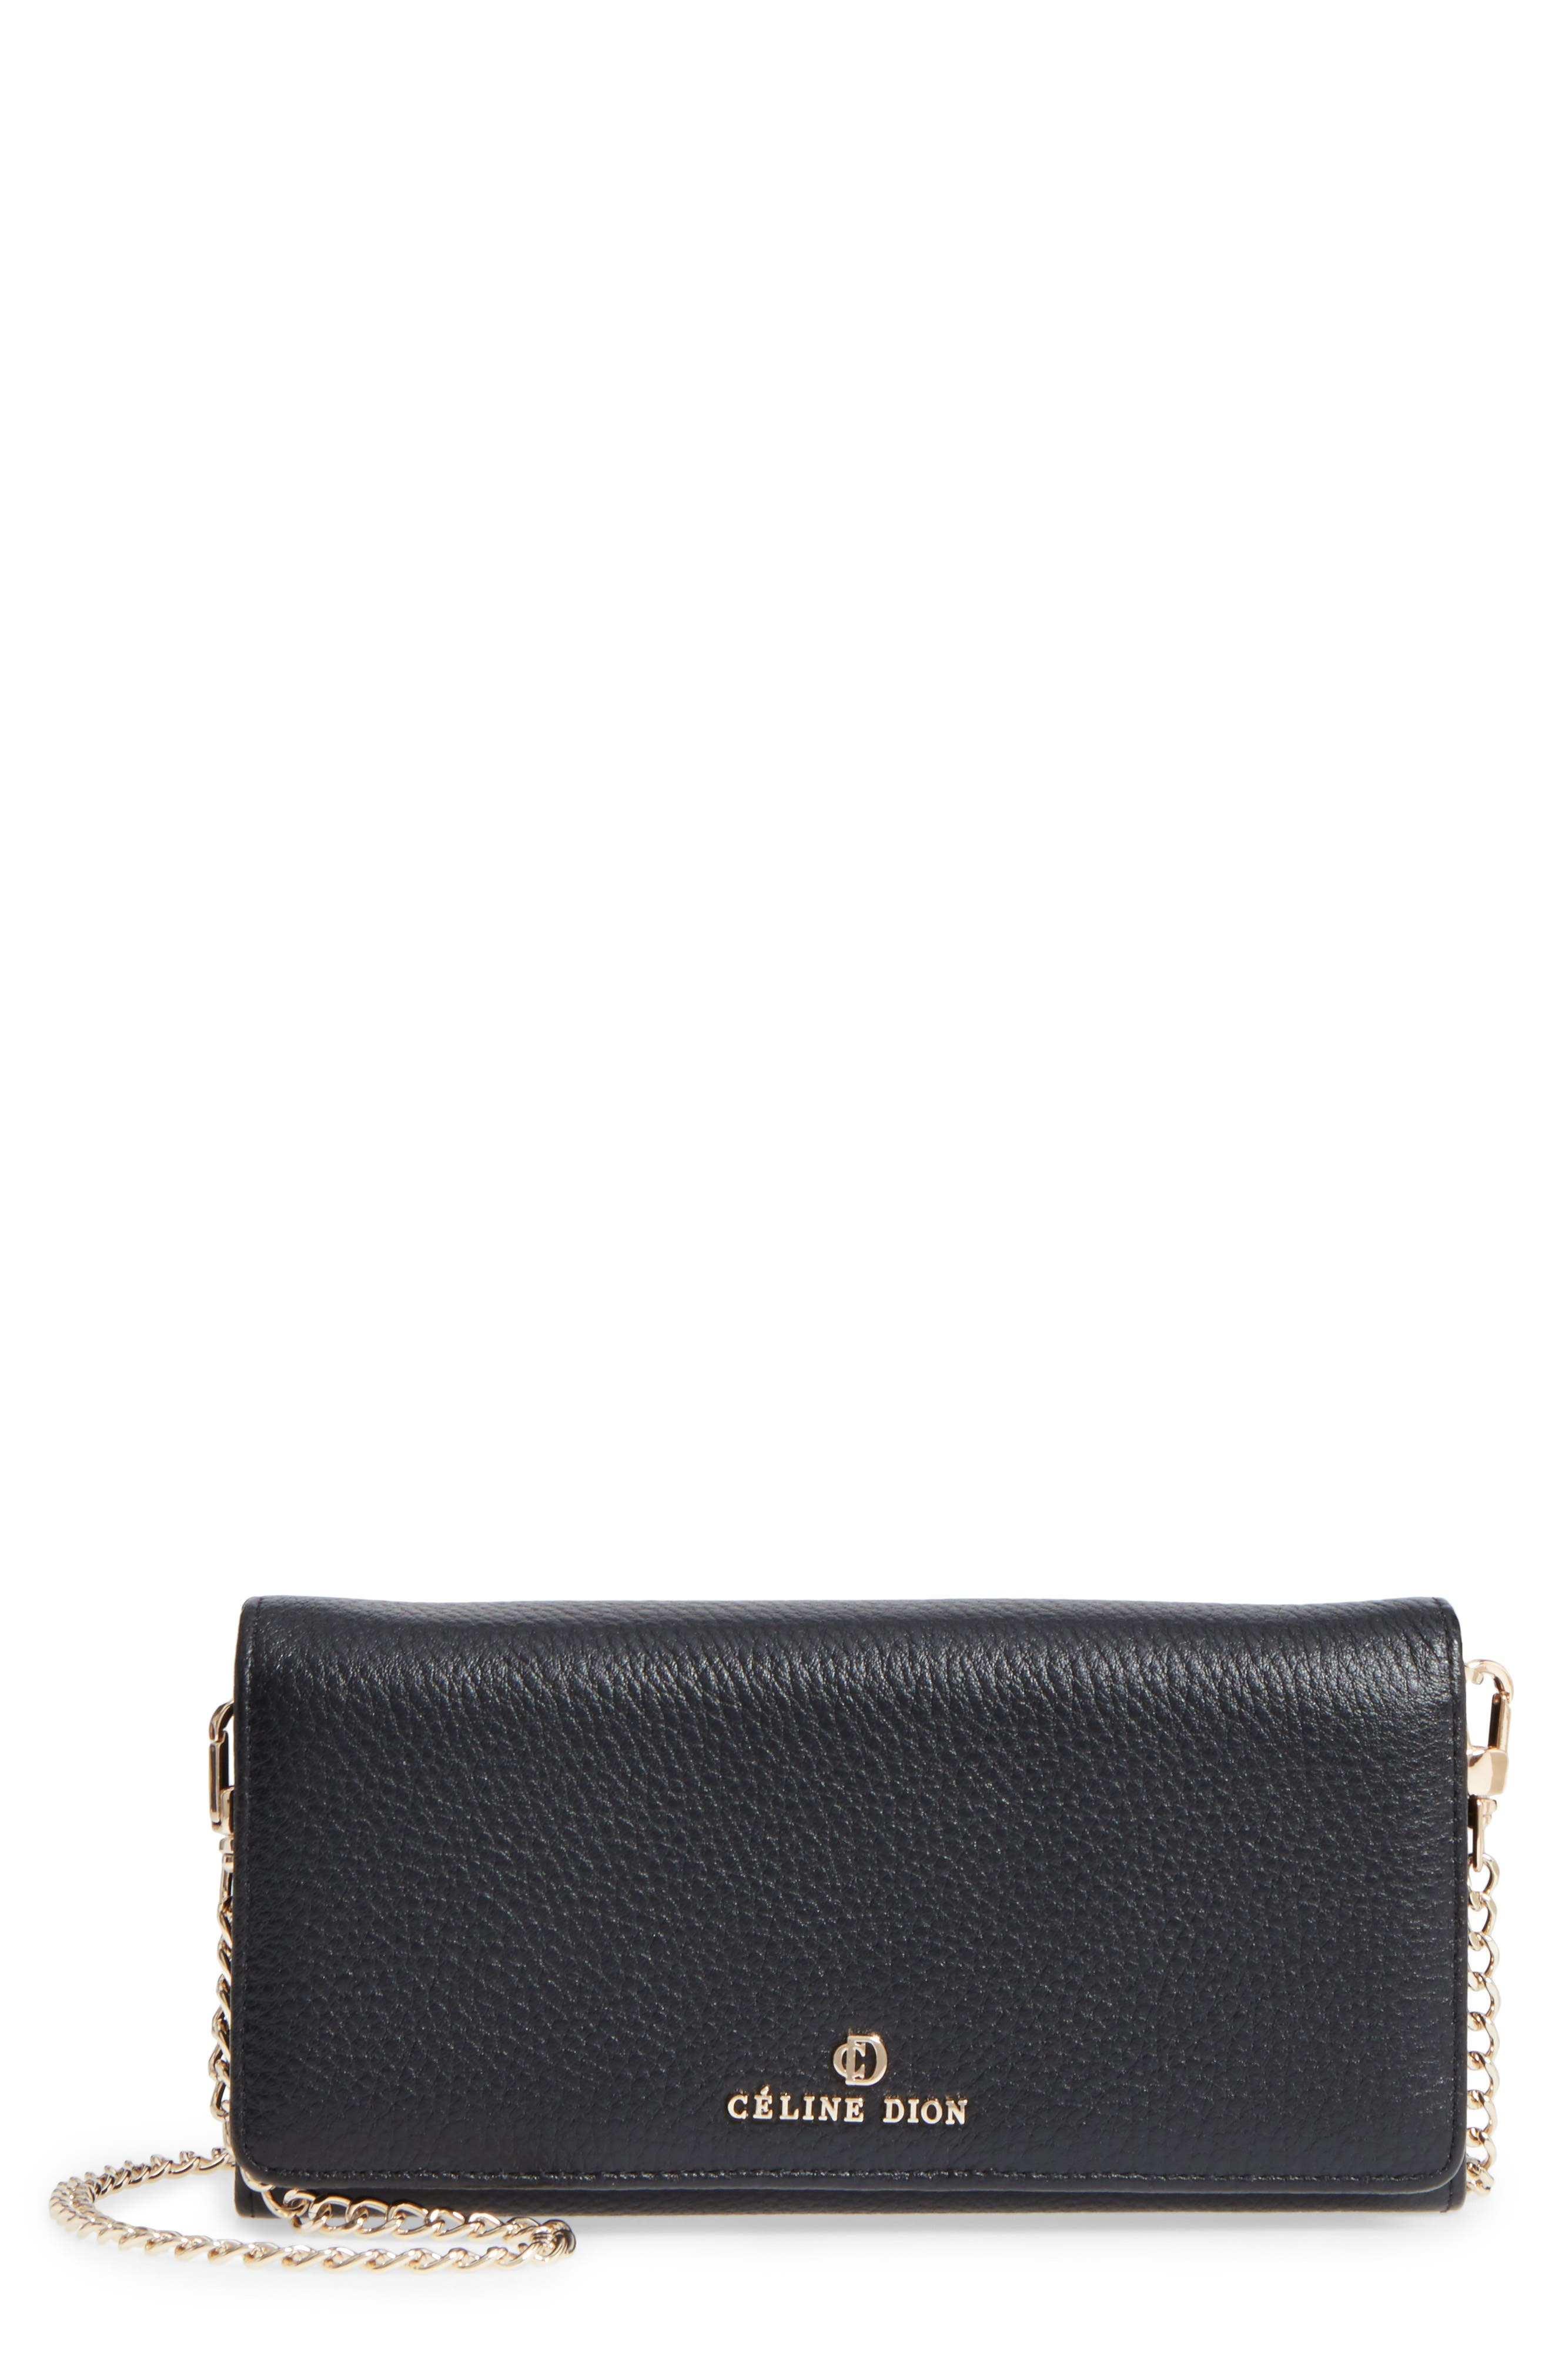 Céline Dion Adagio Leather Crossbody Wallet,                             Main thumbnail 1, color,                             001